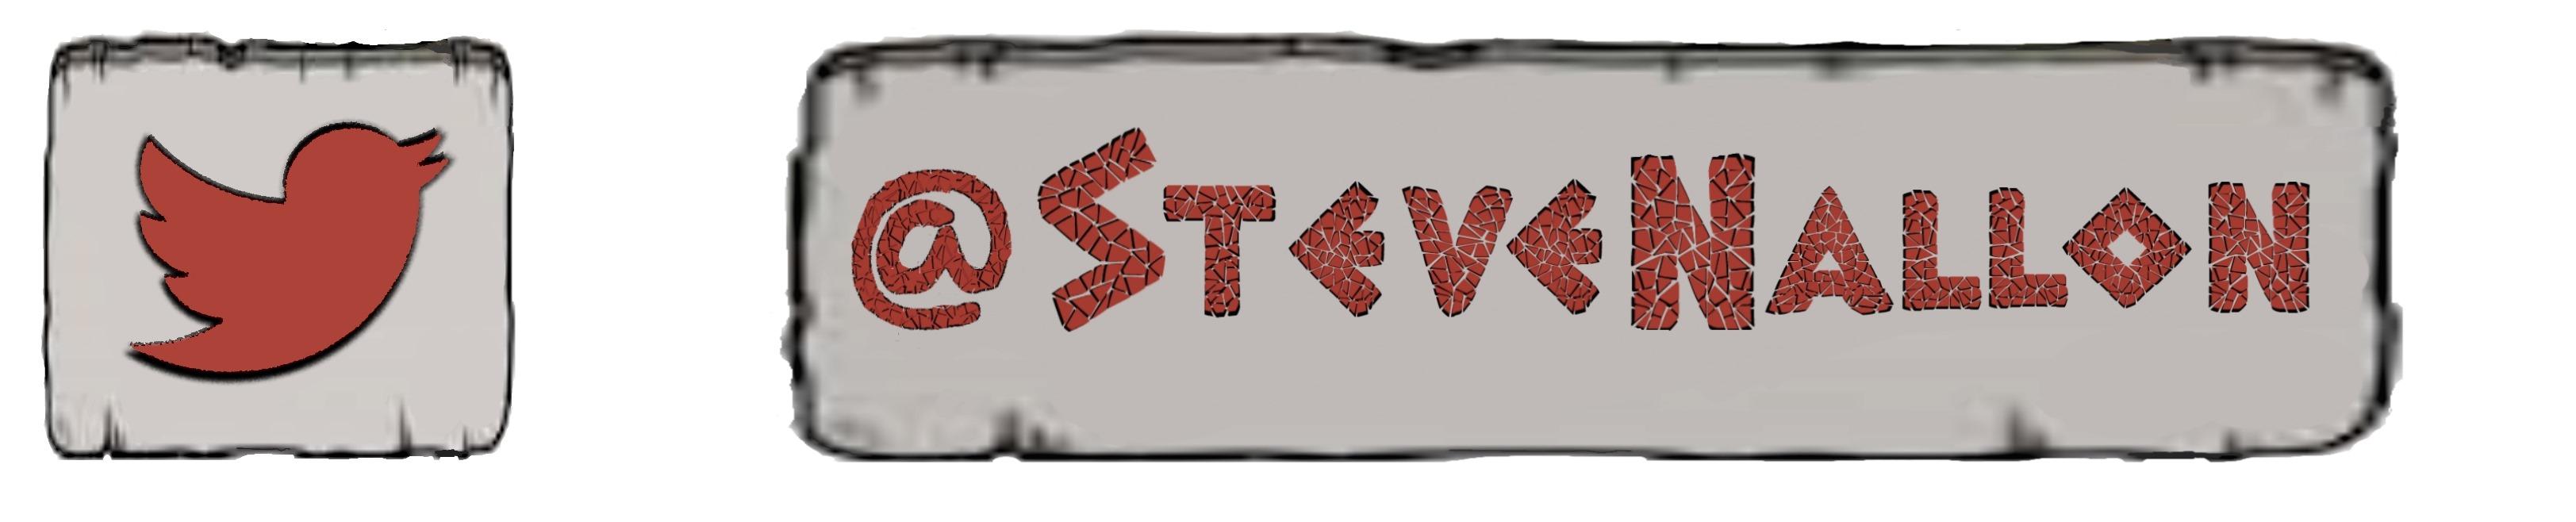 AAA-steve-nallon-odyssey-twitter-lower-res